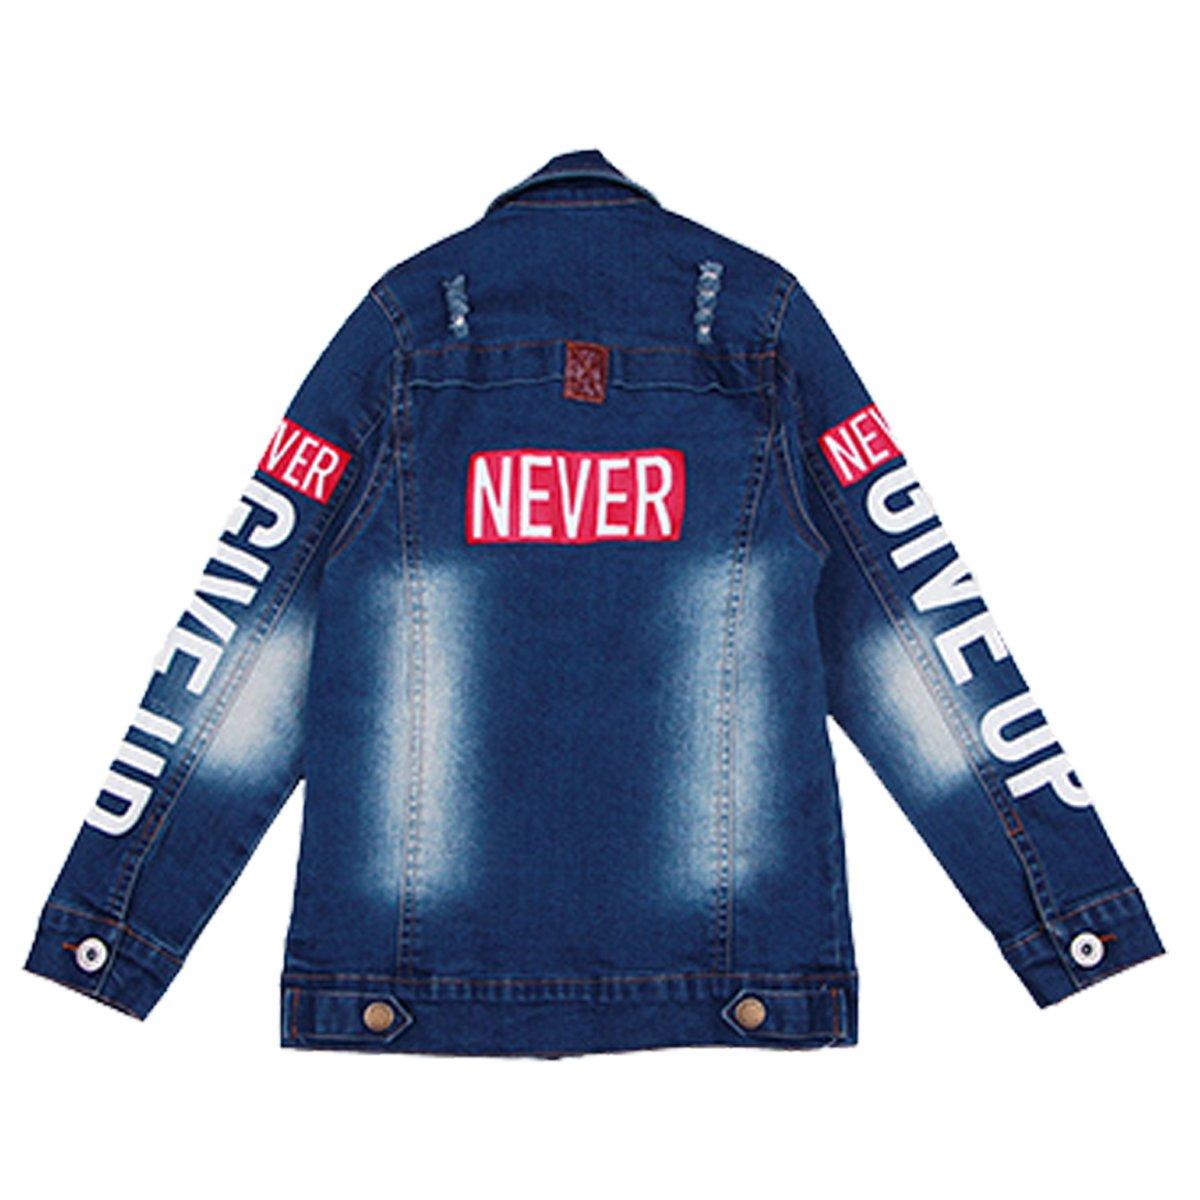 OnlyAngel Kids Boys Classic Blue Washed Single Breasted Denim Jacket Age 4-12